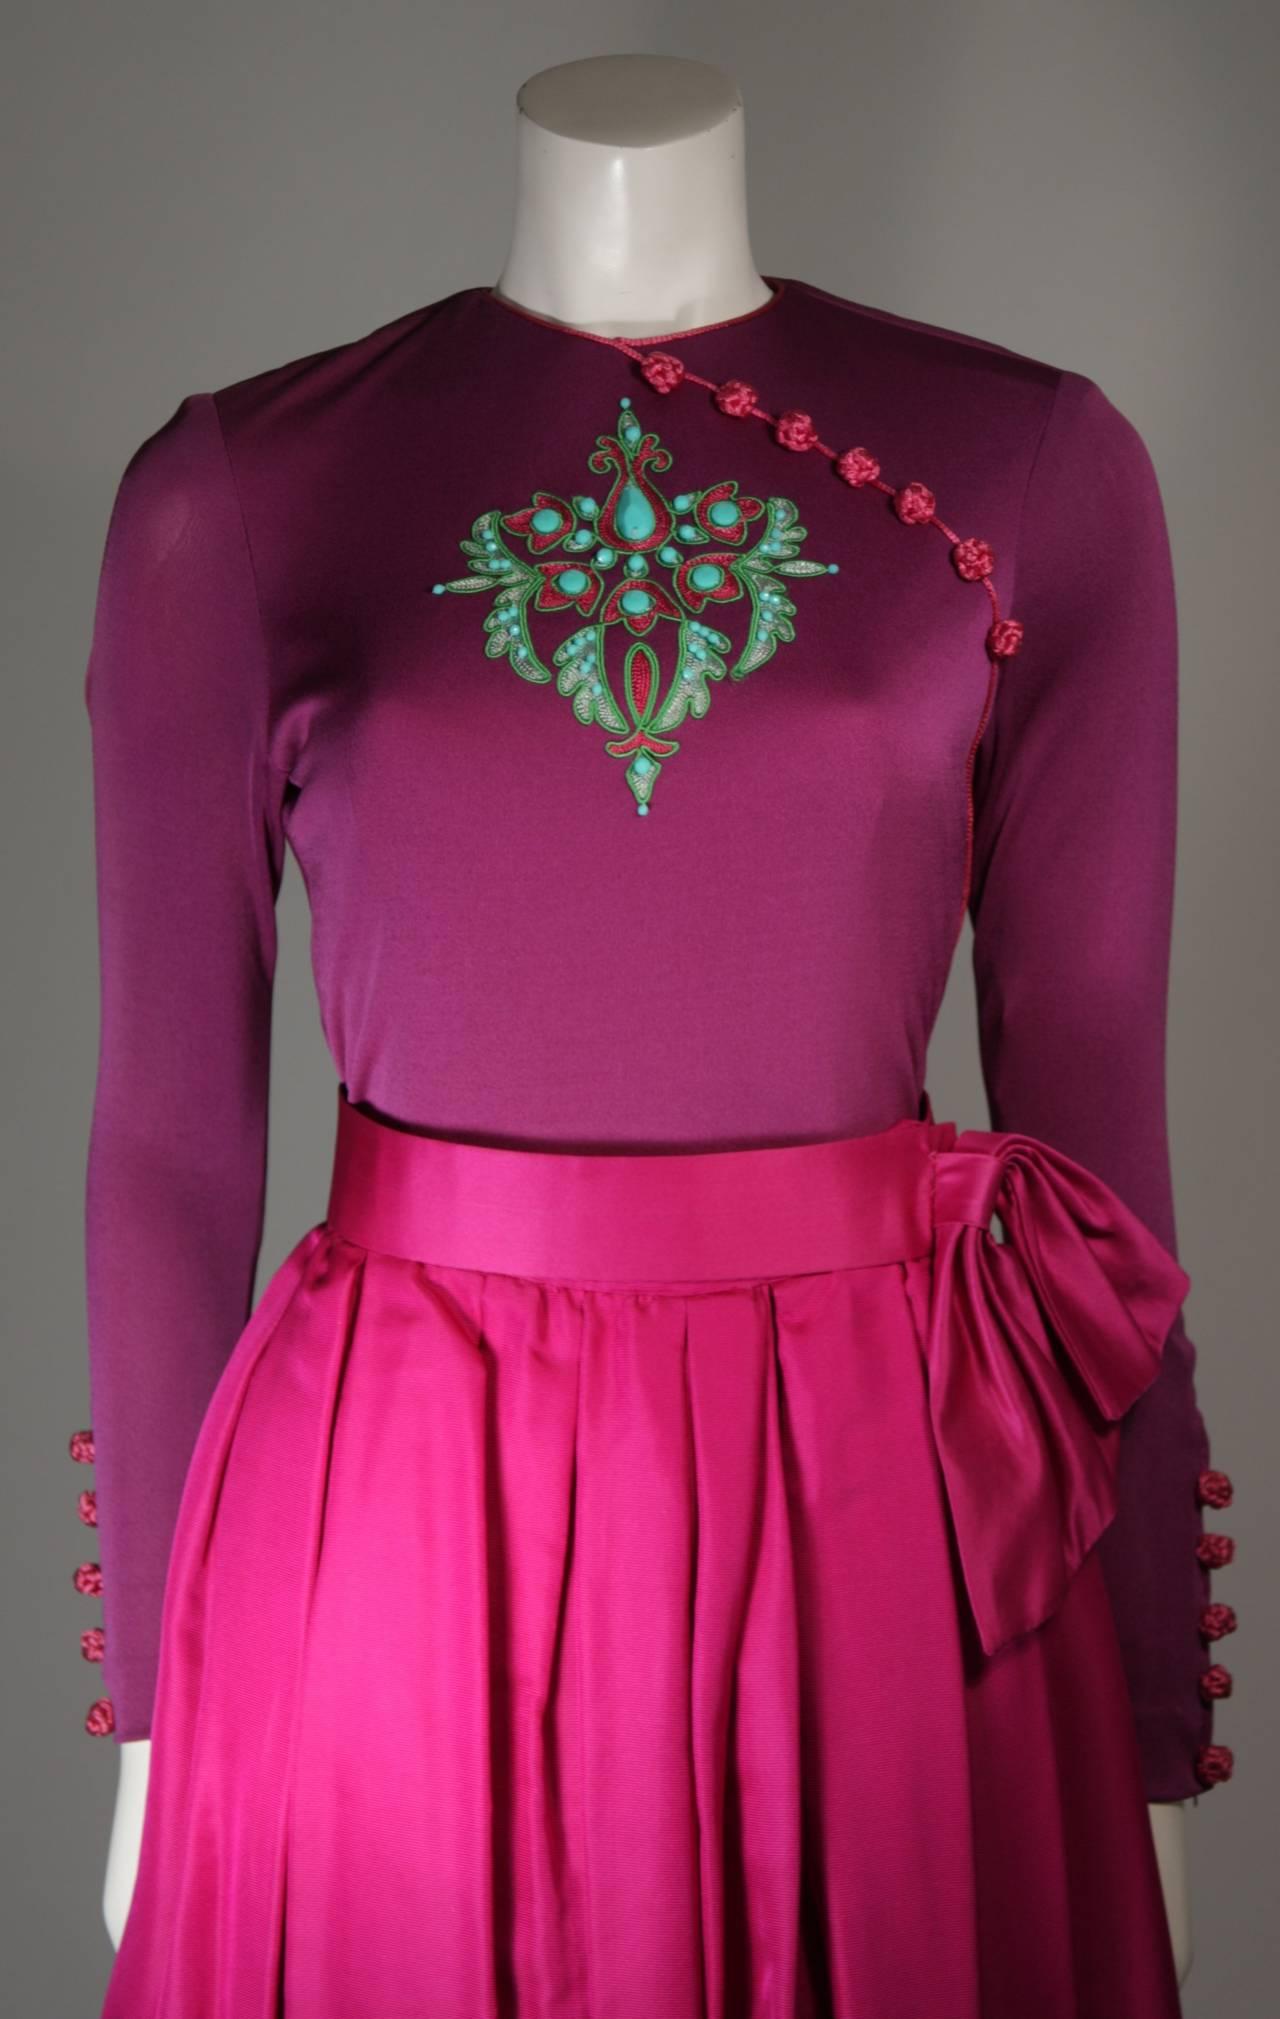 Bob Mackie Evening Skirt Set Ensemble in Purple Size Small 3